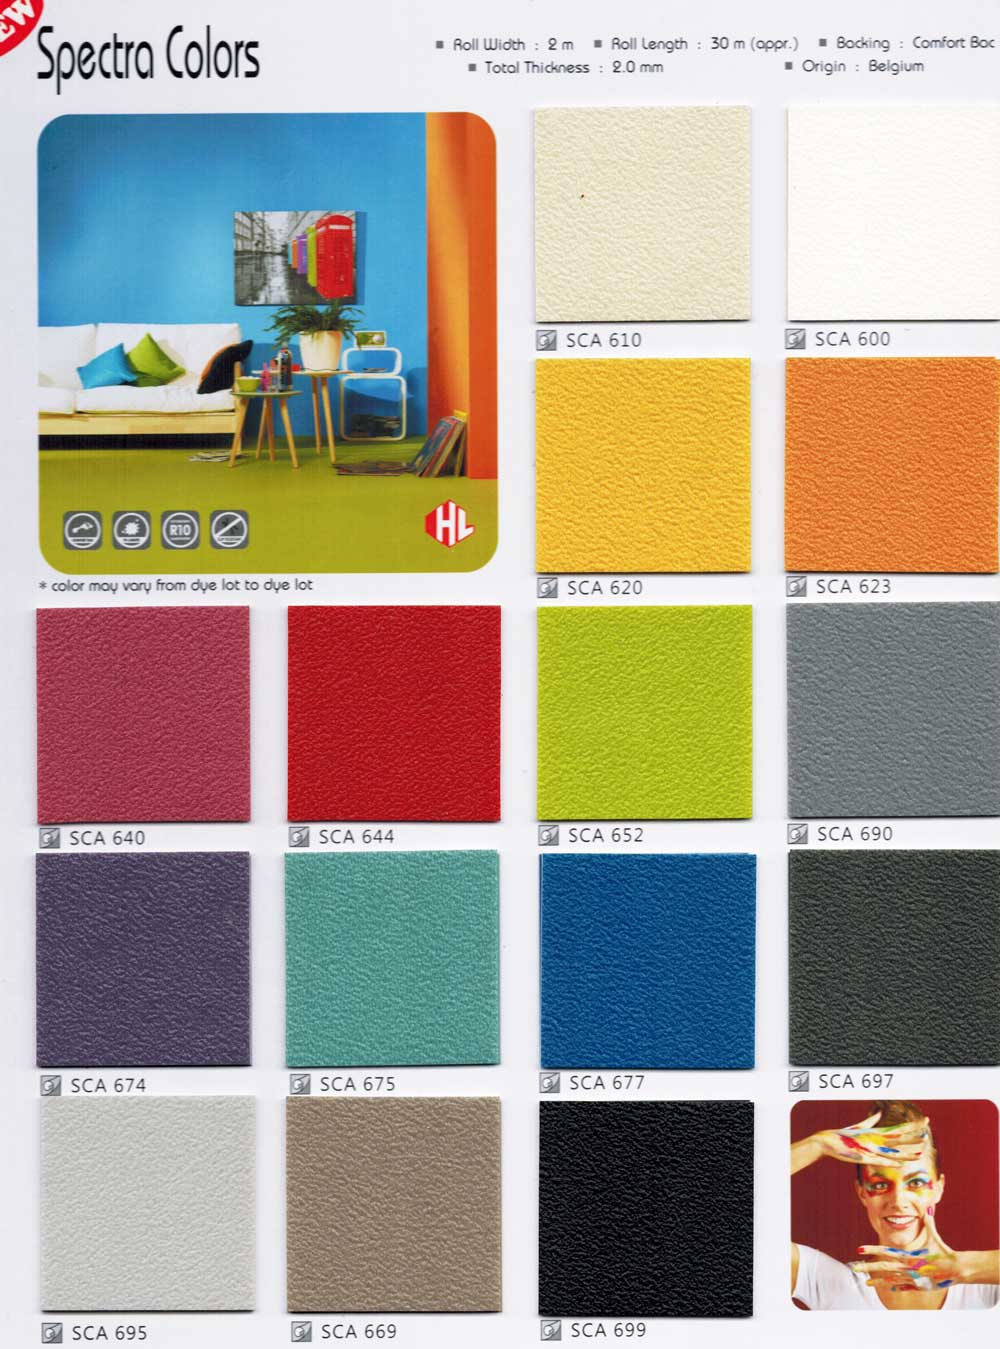 Spectra Colors Belgium Multi Color Sheet Vinyl Flooring